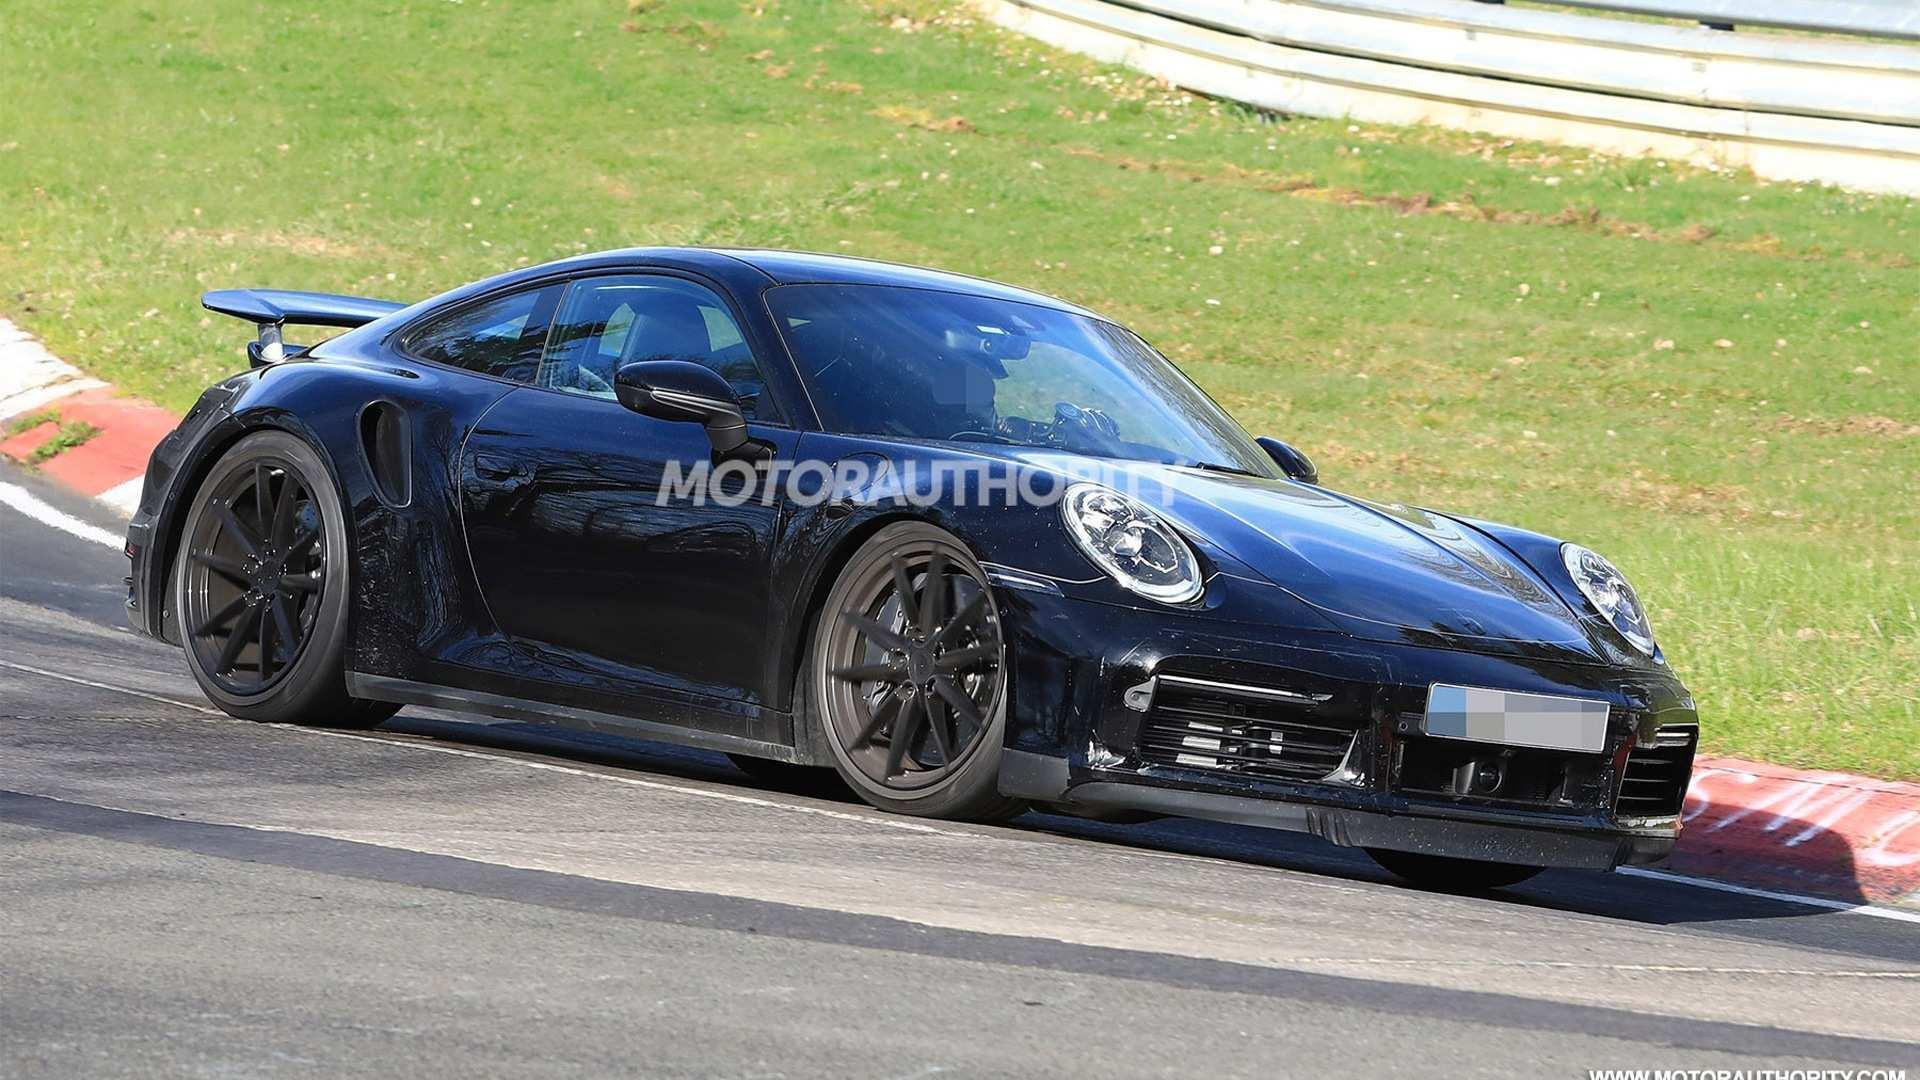 63 All New 2020 Porsche Turbo S Prices for 2020 Porsche Turbo S